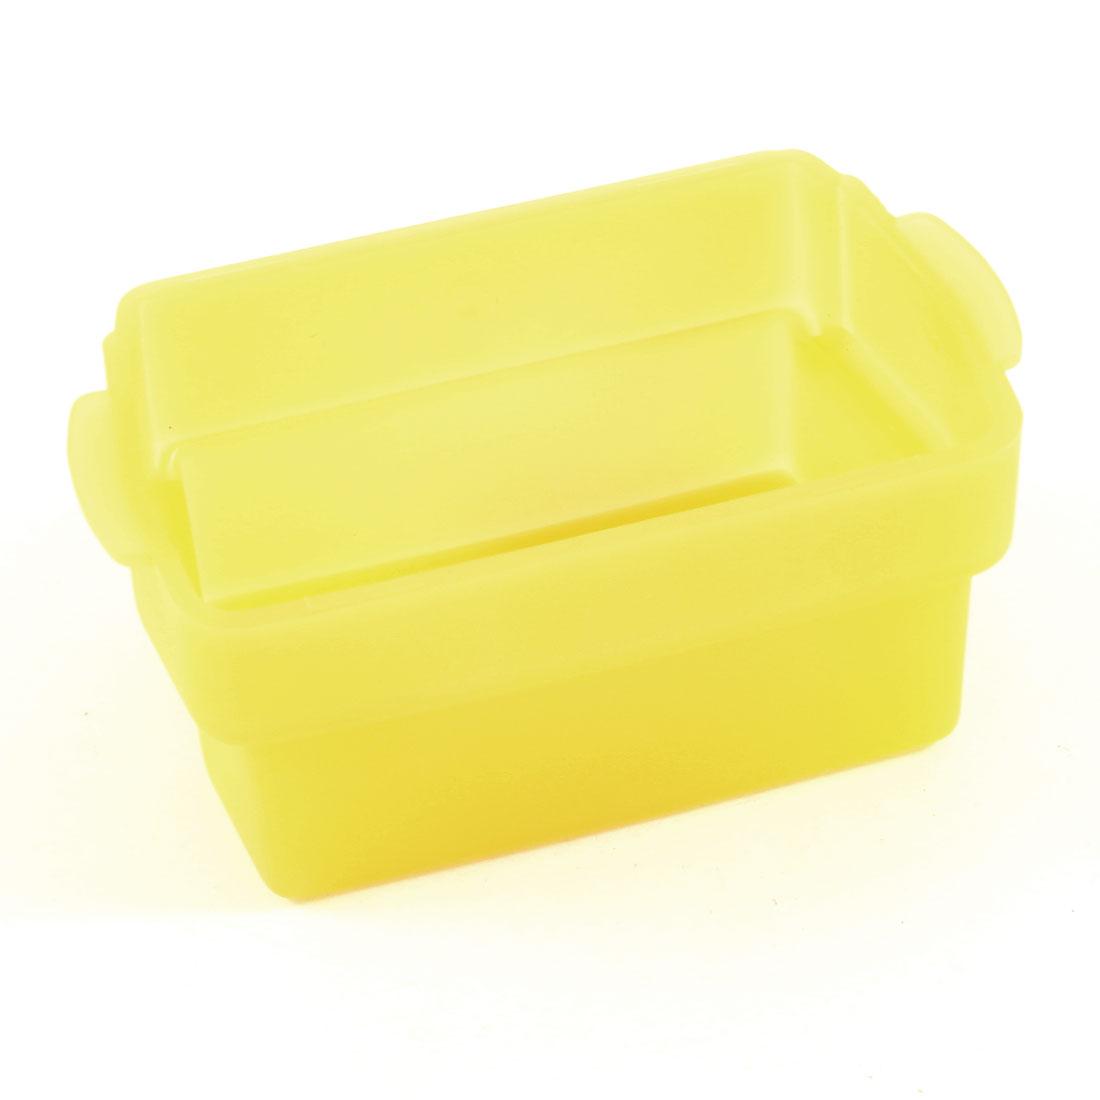 Yellow Digital Camera Photoflash Bounce Flash Diffuser for Nikon SB600